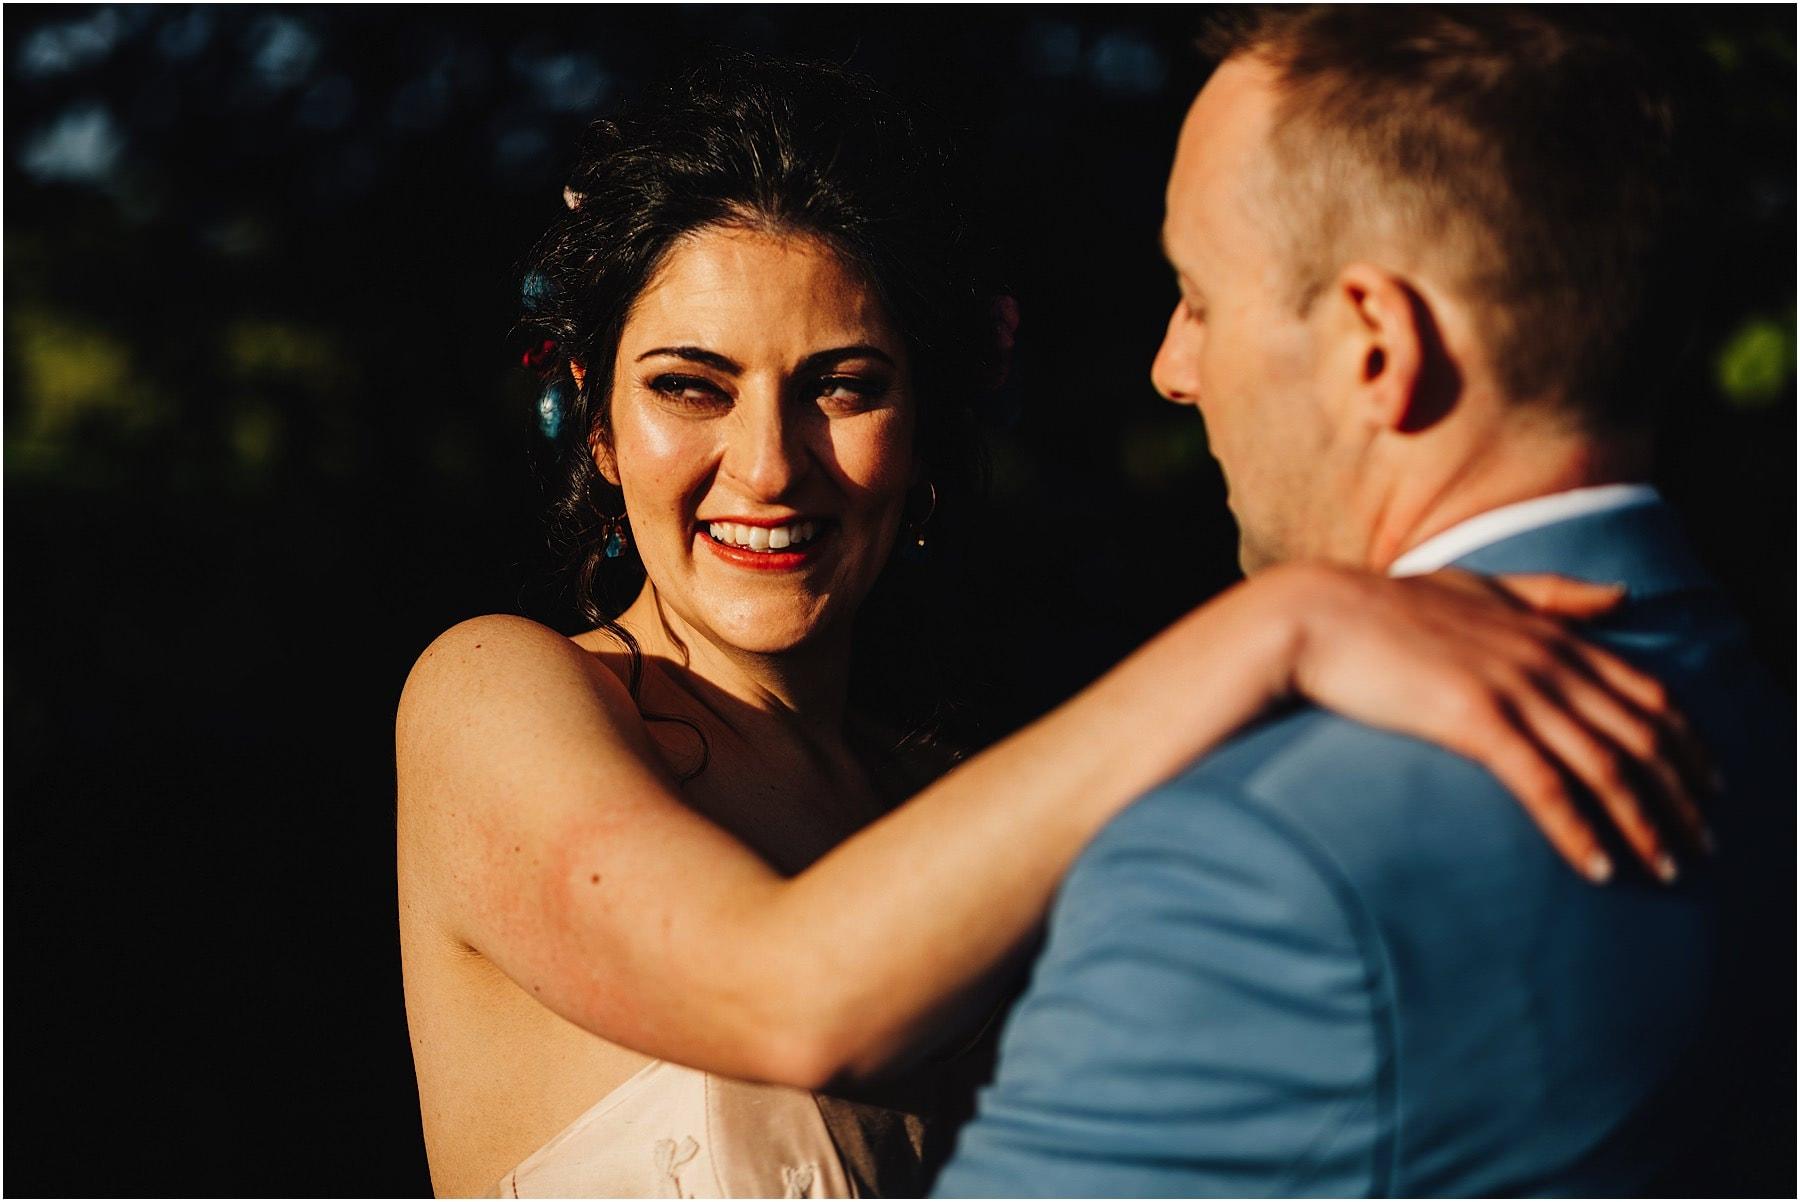 NEWLANDS BISHOP FARM wedding photography